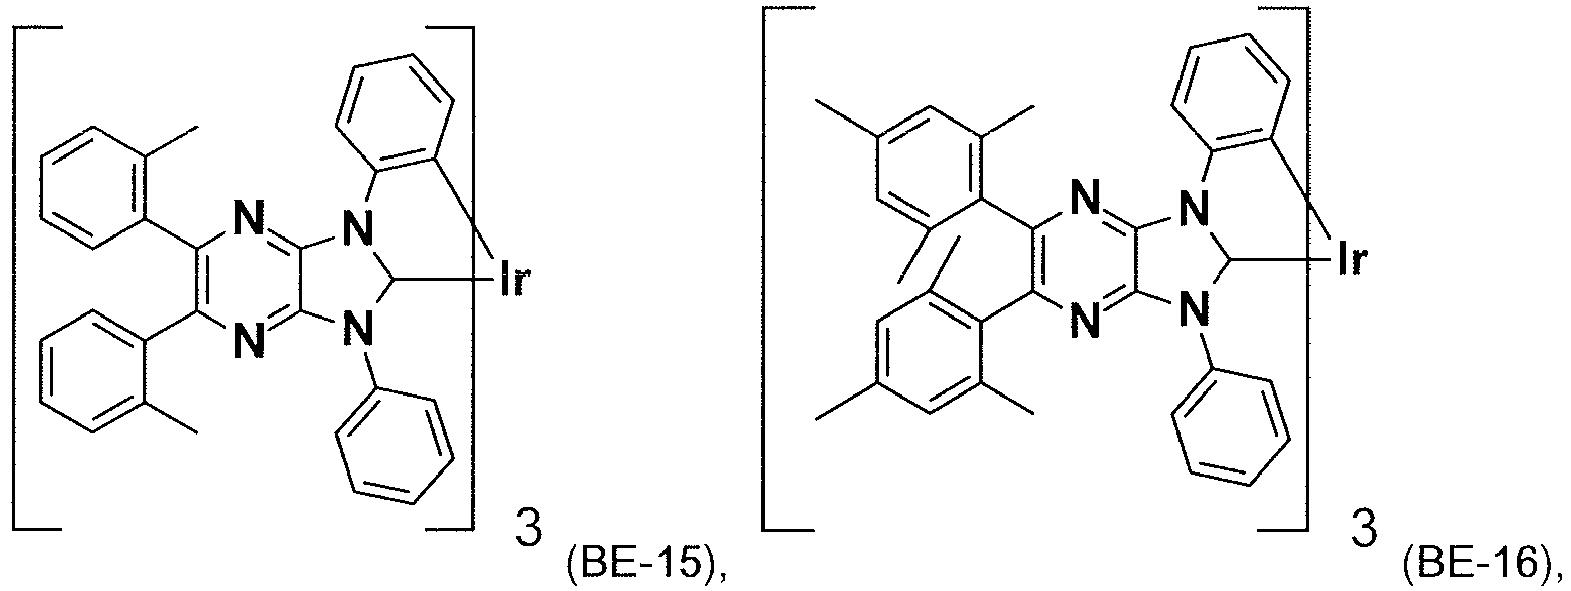 Figure imgb0597